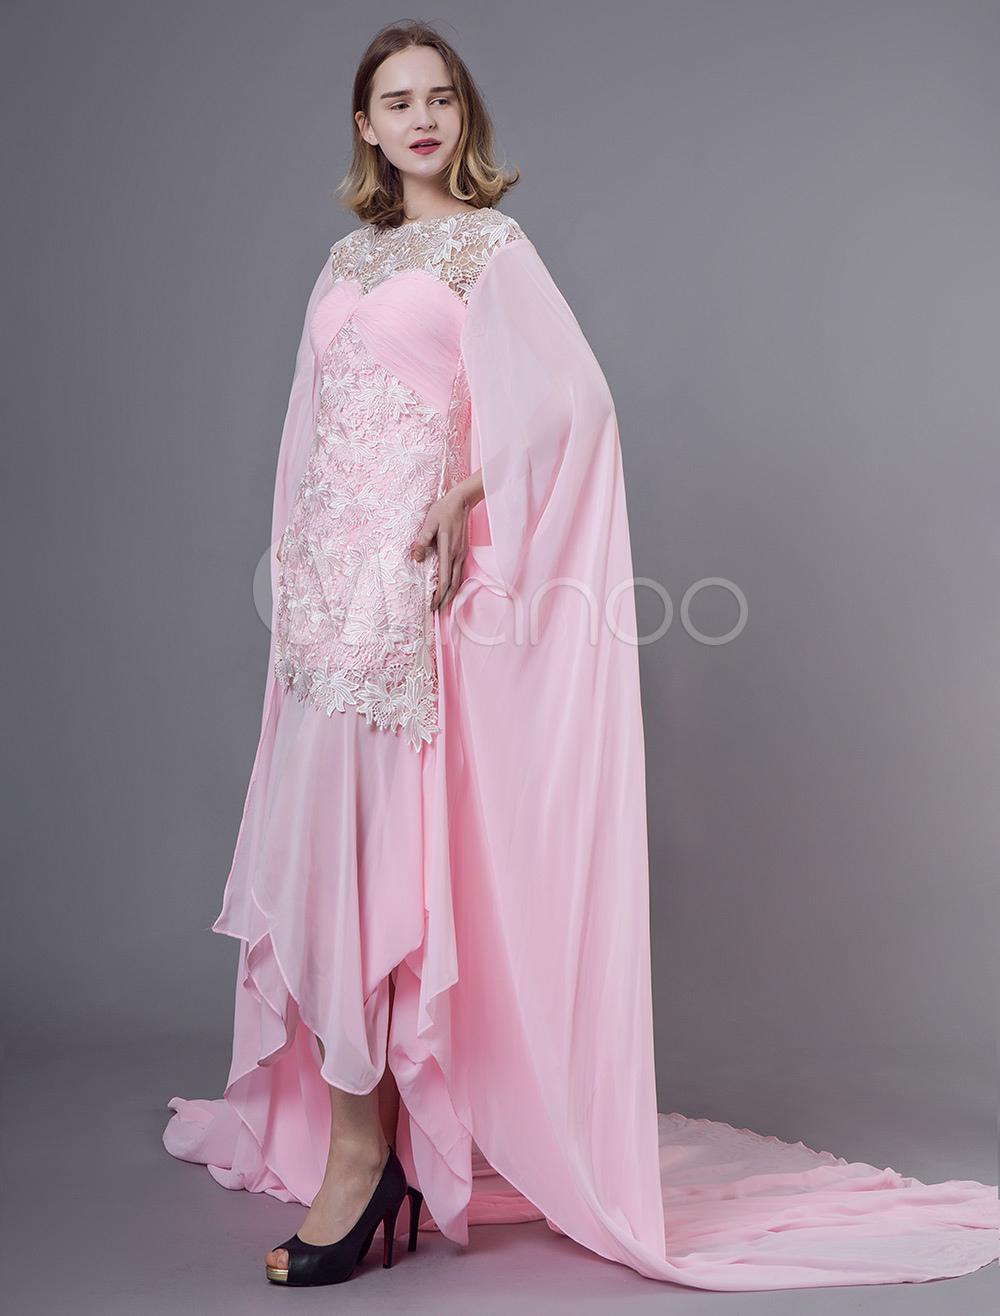 79a94e2ddbcb1 فساتين سهرة فستان شيفون عربي وردي فاتح شيفون واتو - Milanoo.com